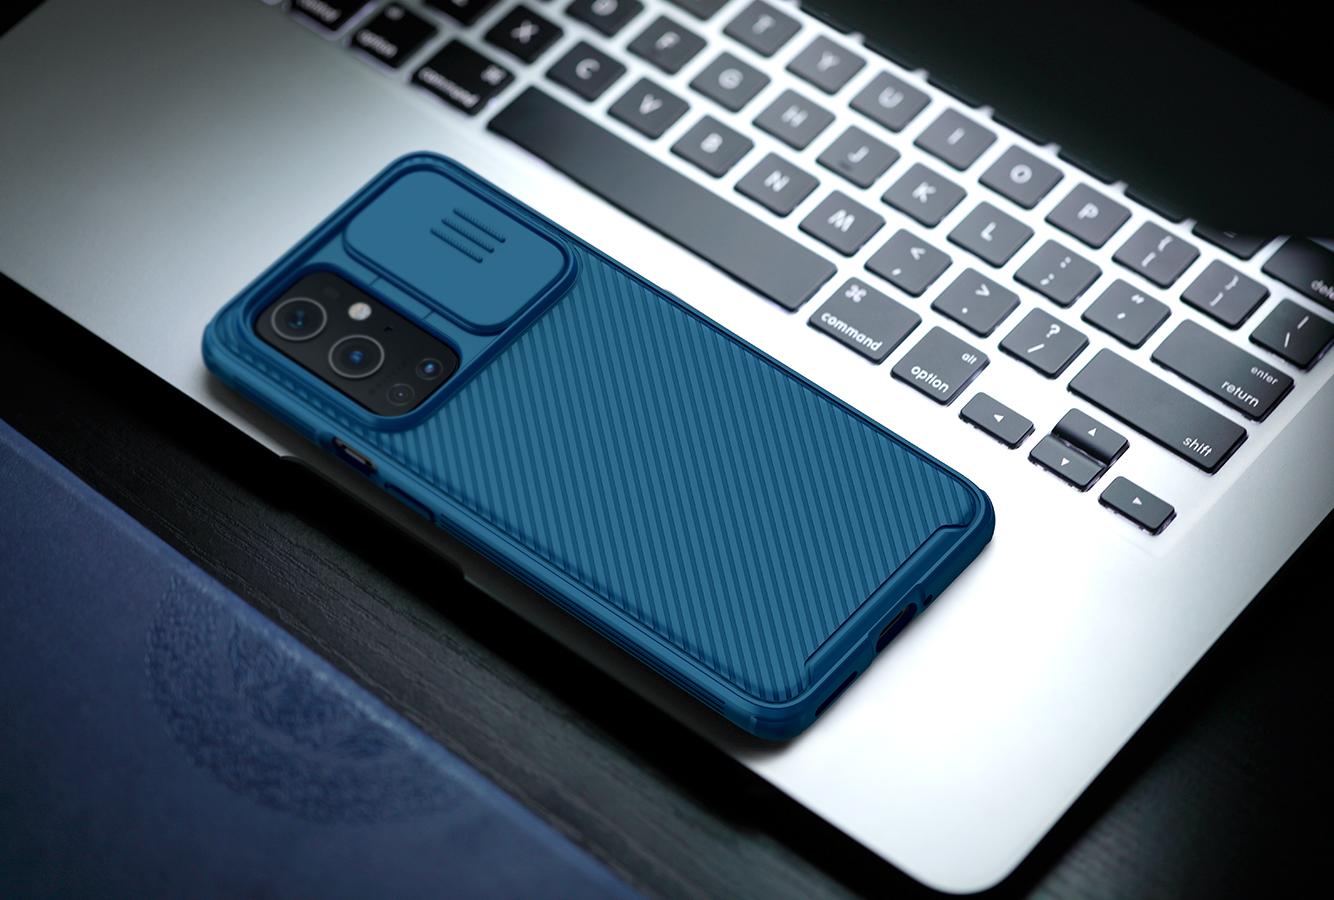 OnePlus_9_Pro_CamShield_Pro_Case-11.jpg